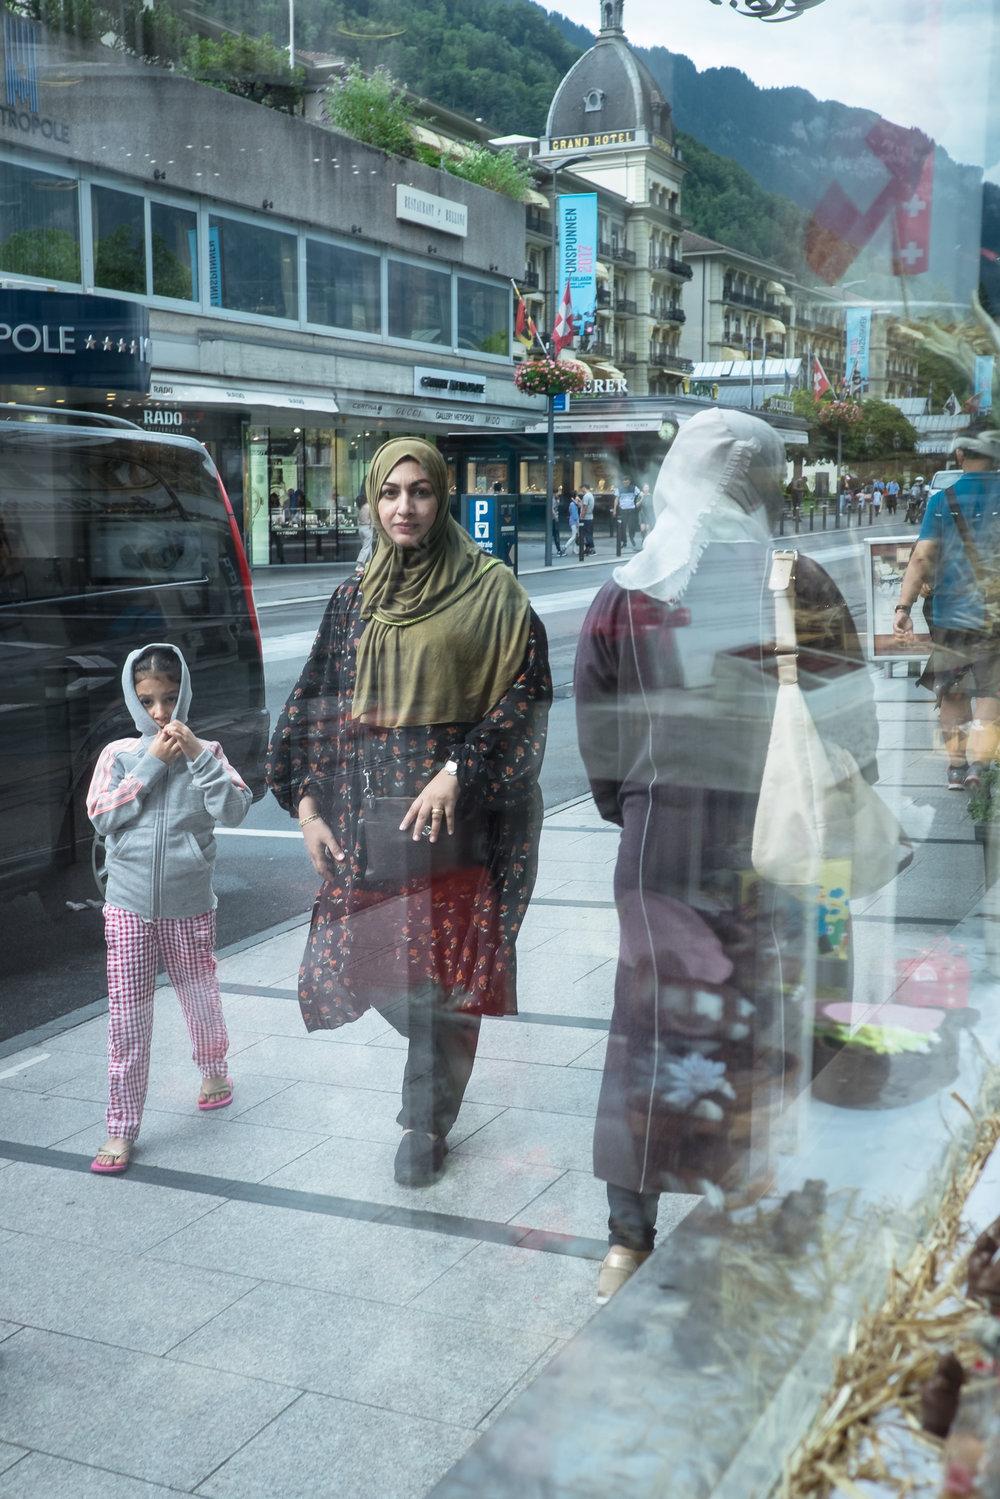 26_Interlaken_Muslime_MarcoZanoni.JPG